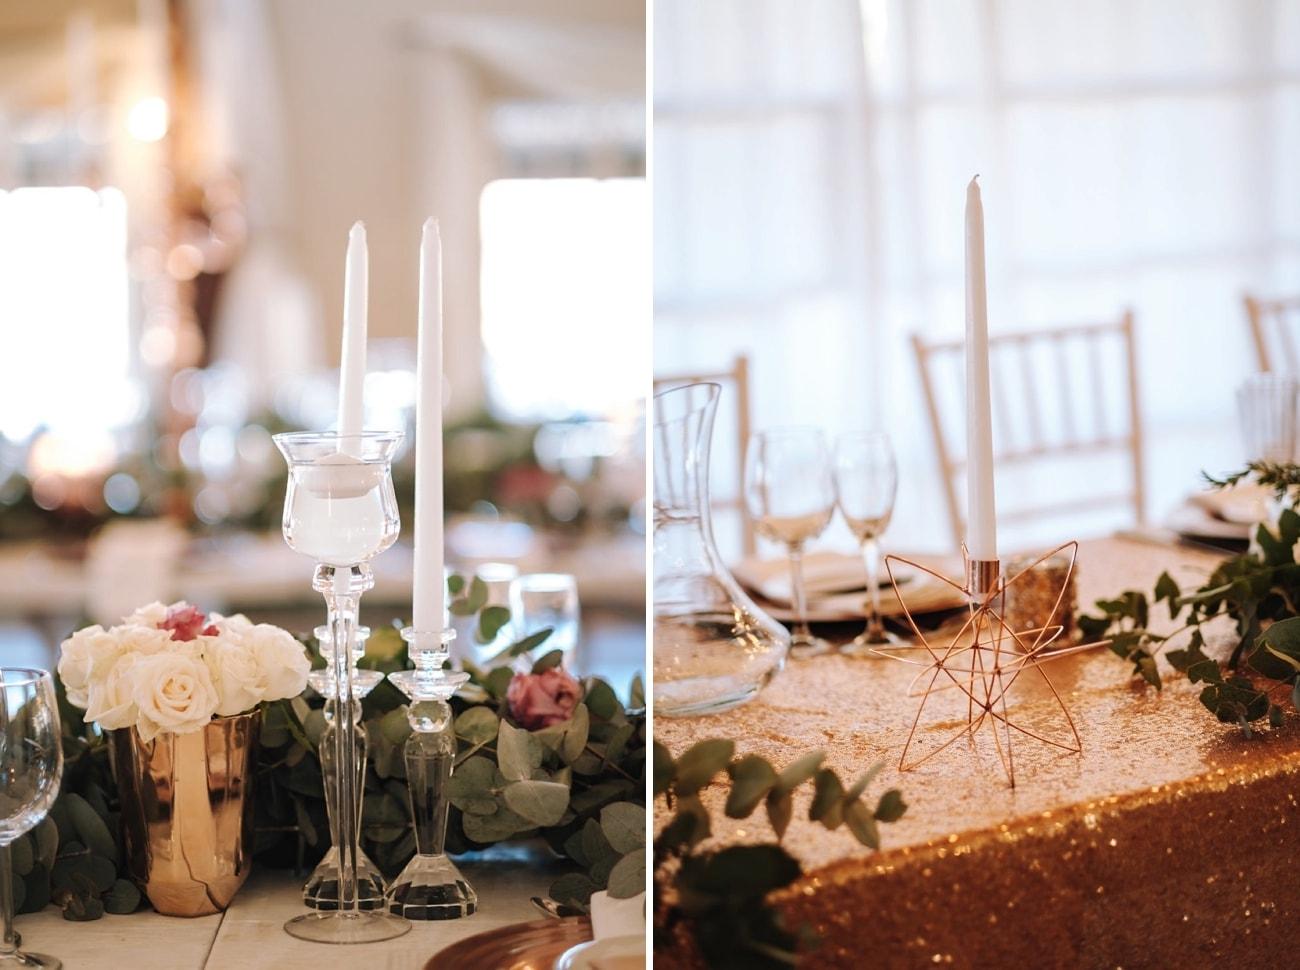 Winter Wedding Reception Decor | Image: The Shank Tank